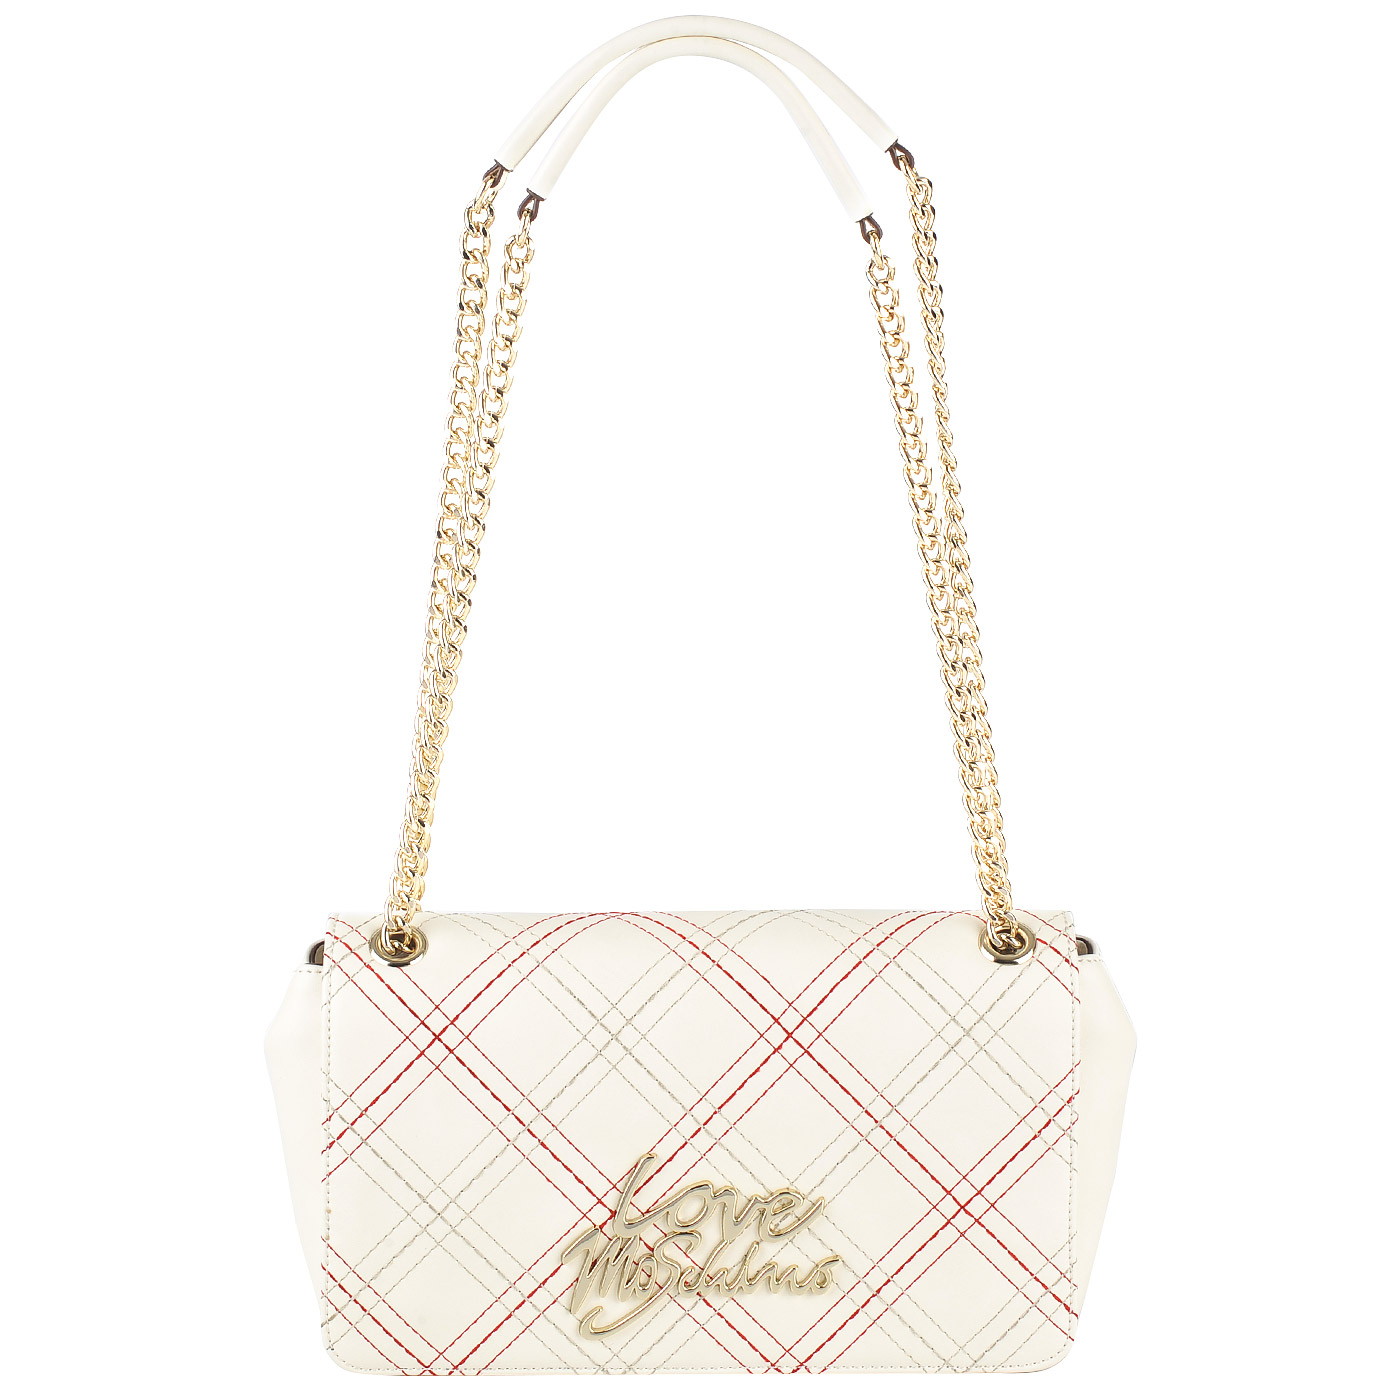 42df97291a89 Женская сумка через плечо Love Moschino Stitching Женская сумка через плечо Love  Moschino Stitching ...